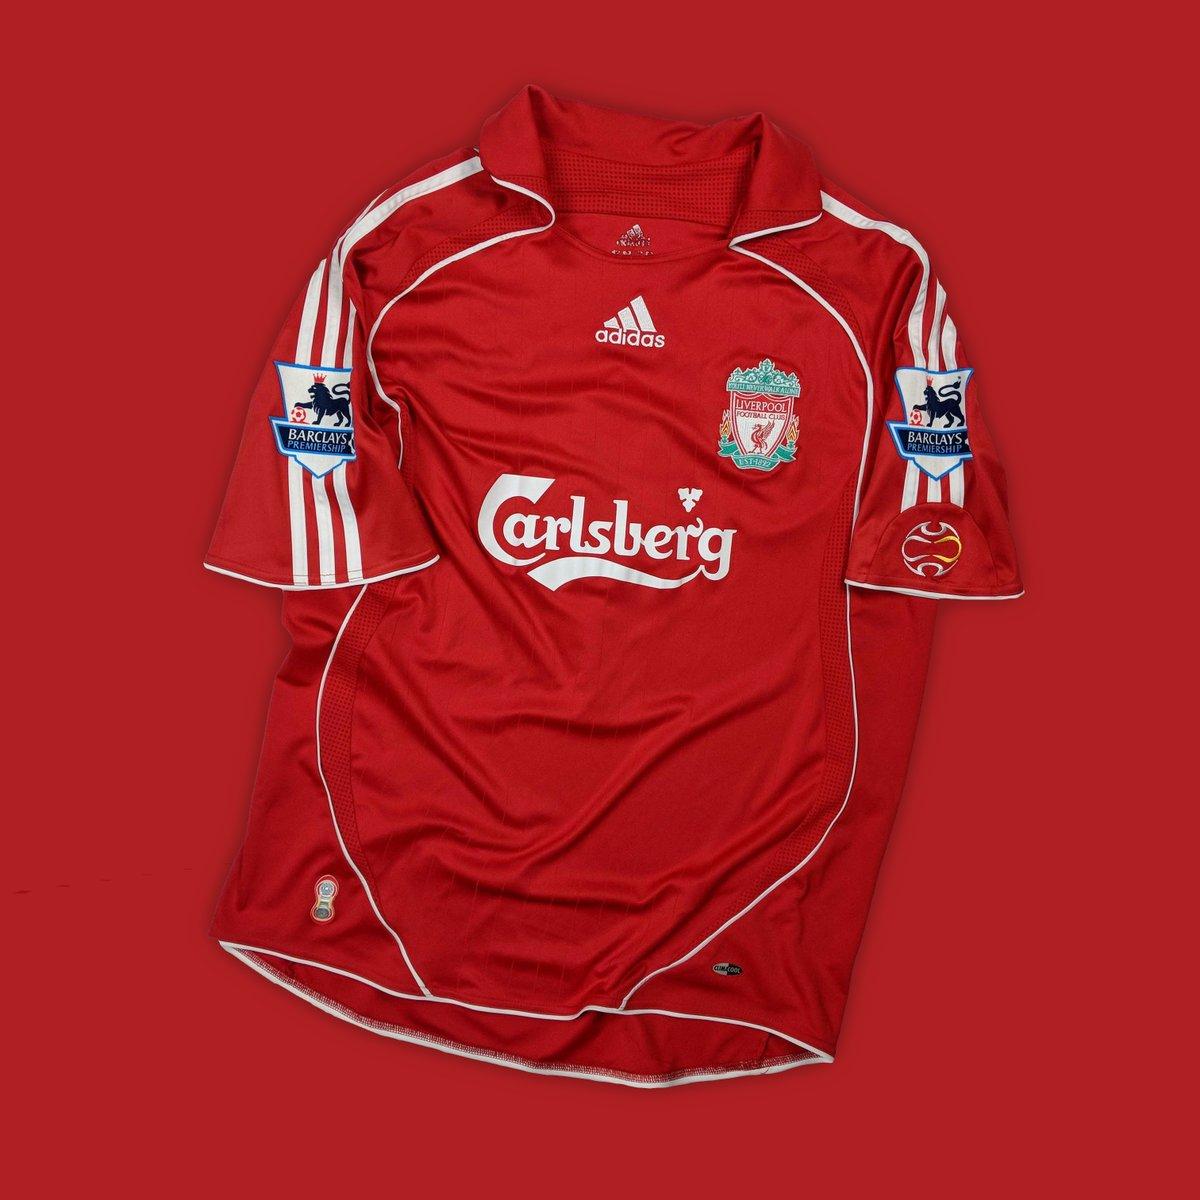 online retailer 84cf2 59b70 Classic Football Shirts on Twitter: